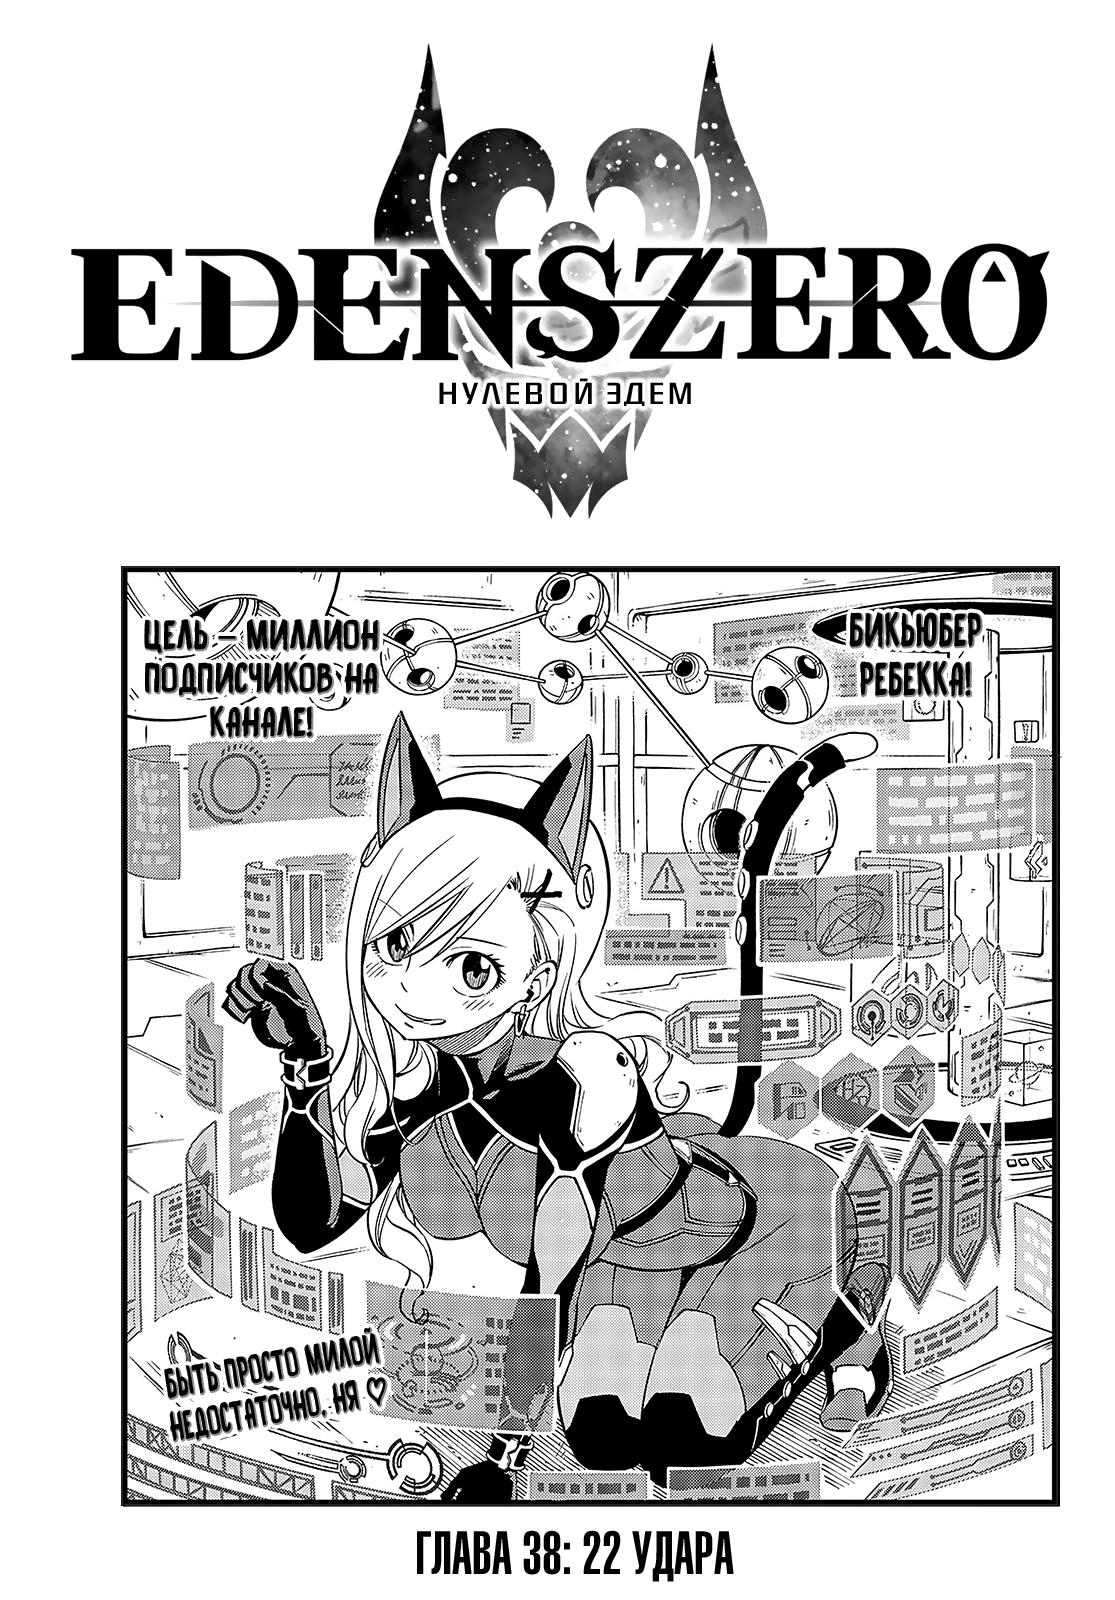 https://r2.ninemanga.com/comics/pic3/25/33817/1329400/1554256096238.jpg Page 1